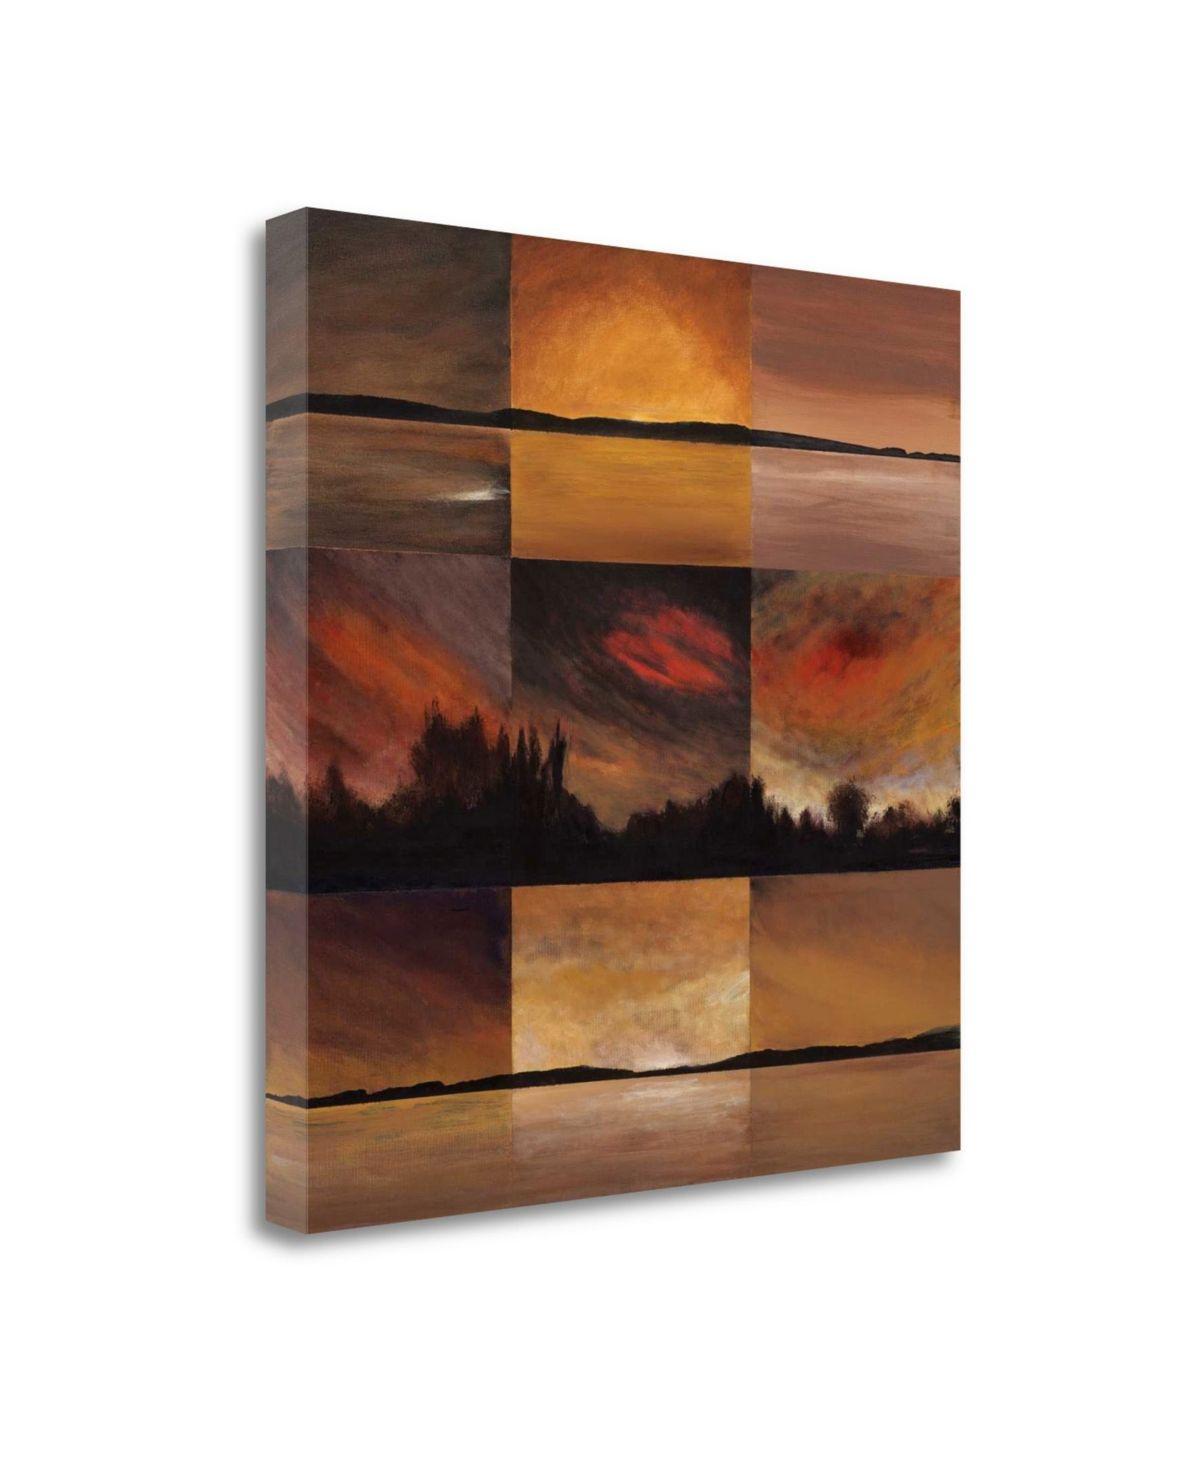 Tangletown Fine Art Horizontal Lines By Earl Kaminsky Fine Art Giclee Print On Gallery Wrap Canvas 30 X 30 Multi Art Wrapped Canvas Canvas